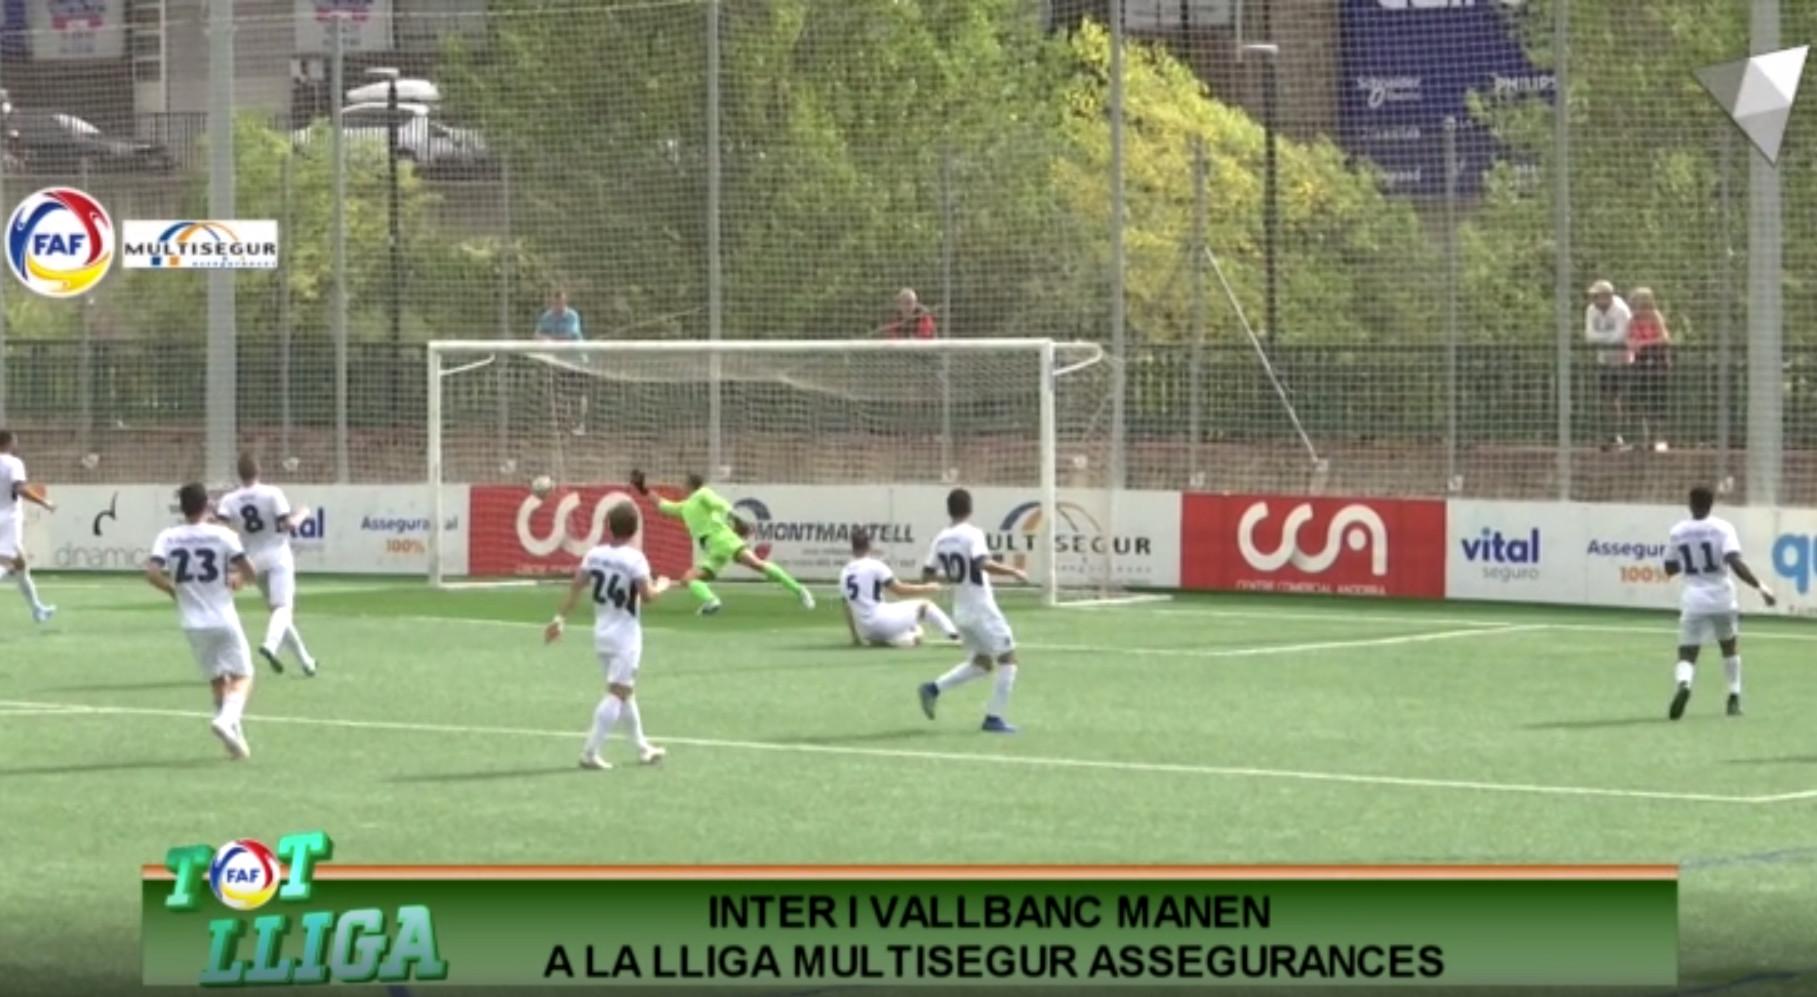 Tot Lliga - Inter i Vallbanc manen